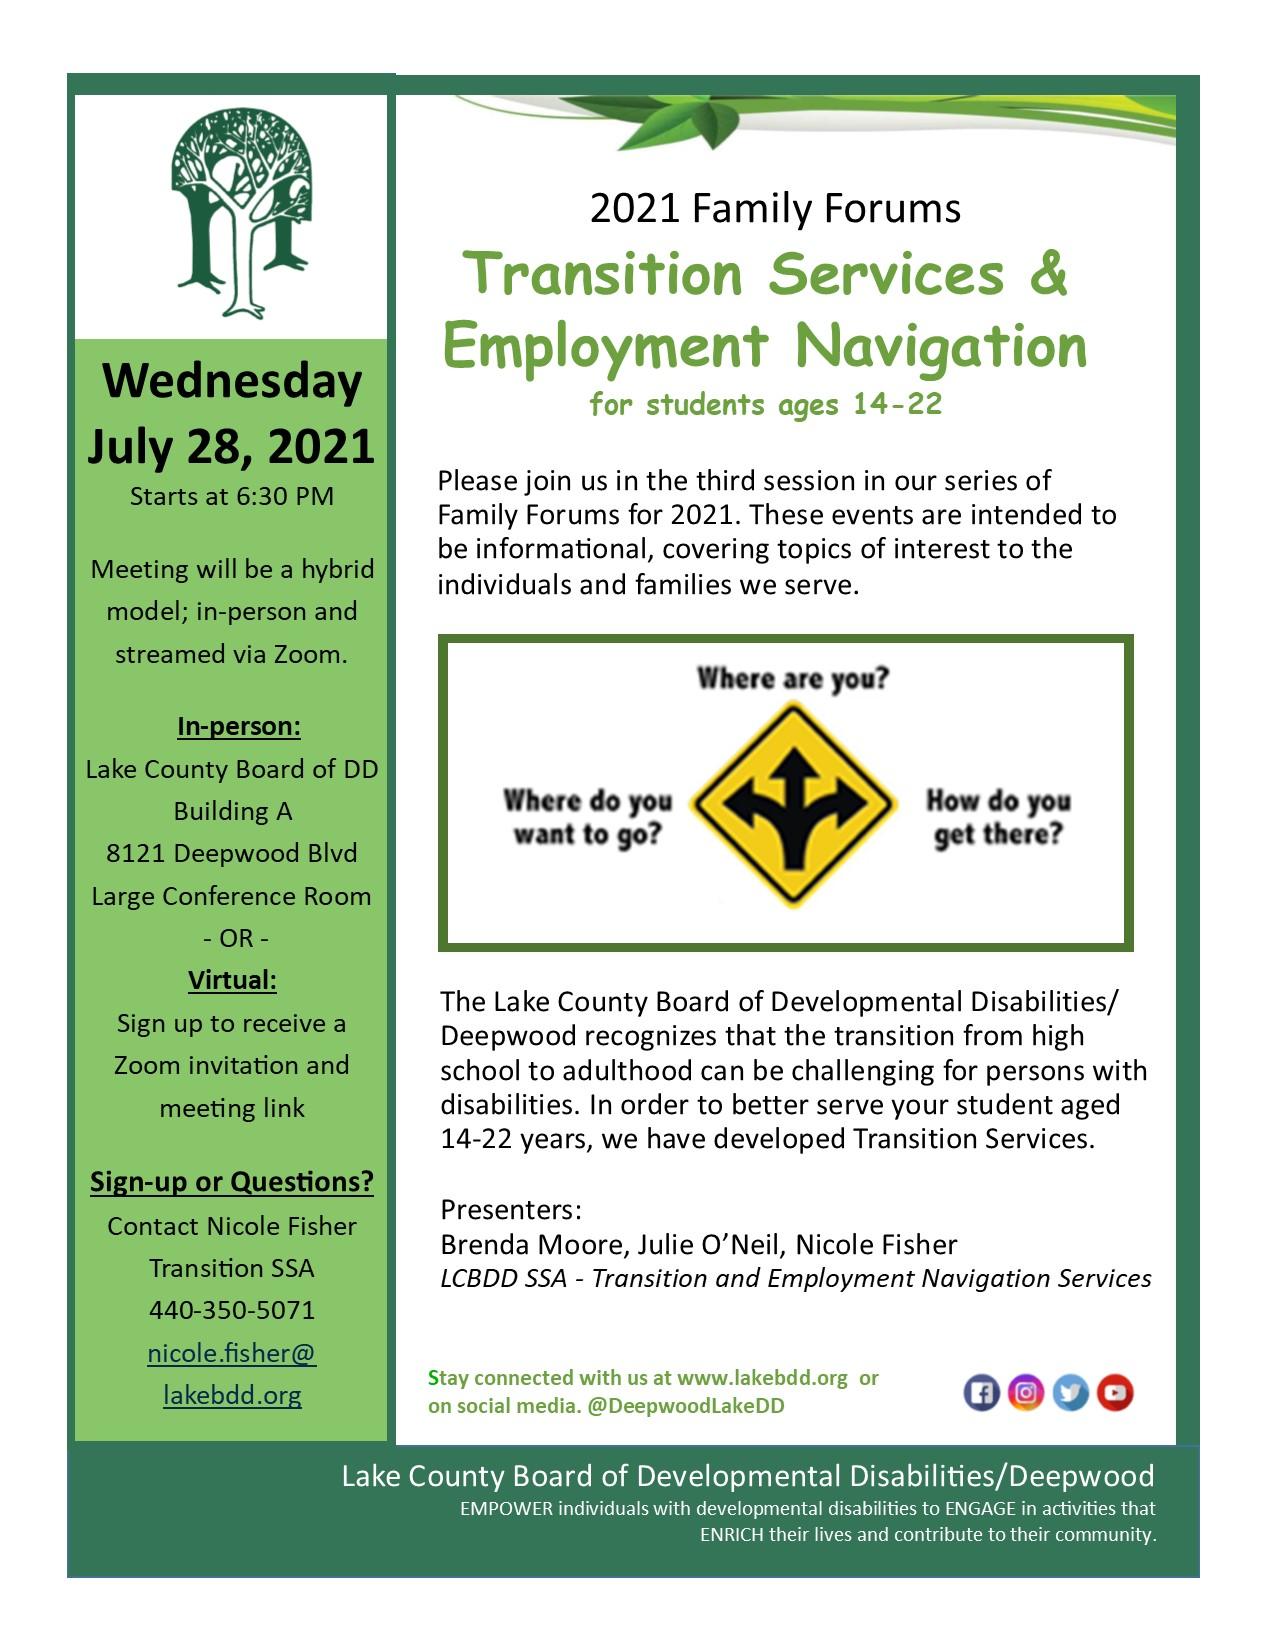 Family Forum: Transition Services & Employment Navigation